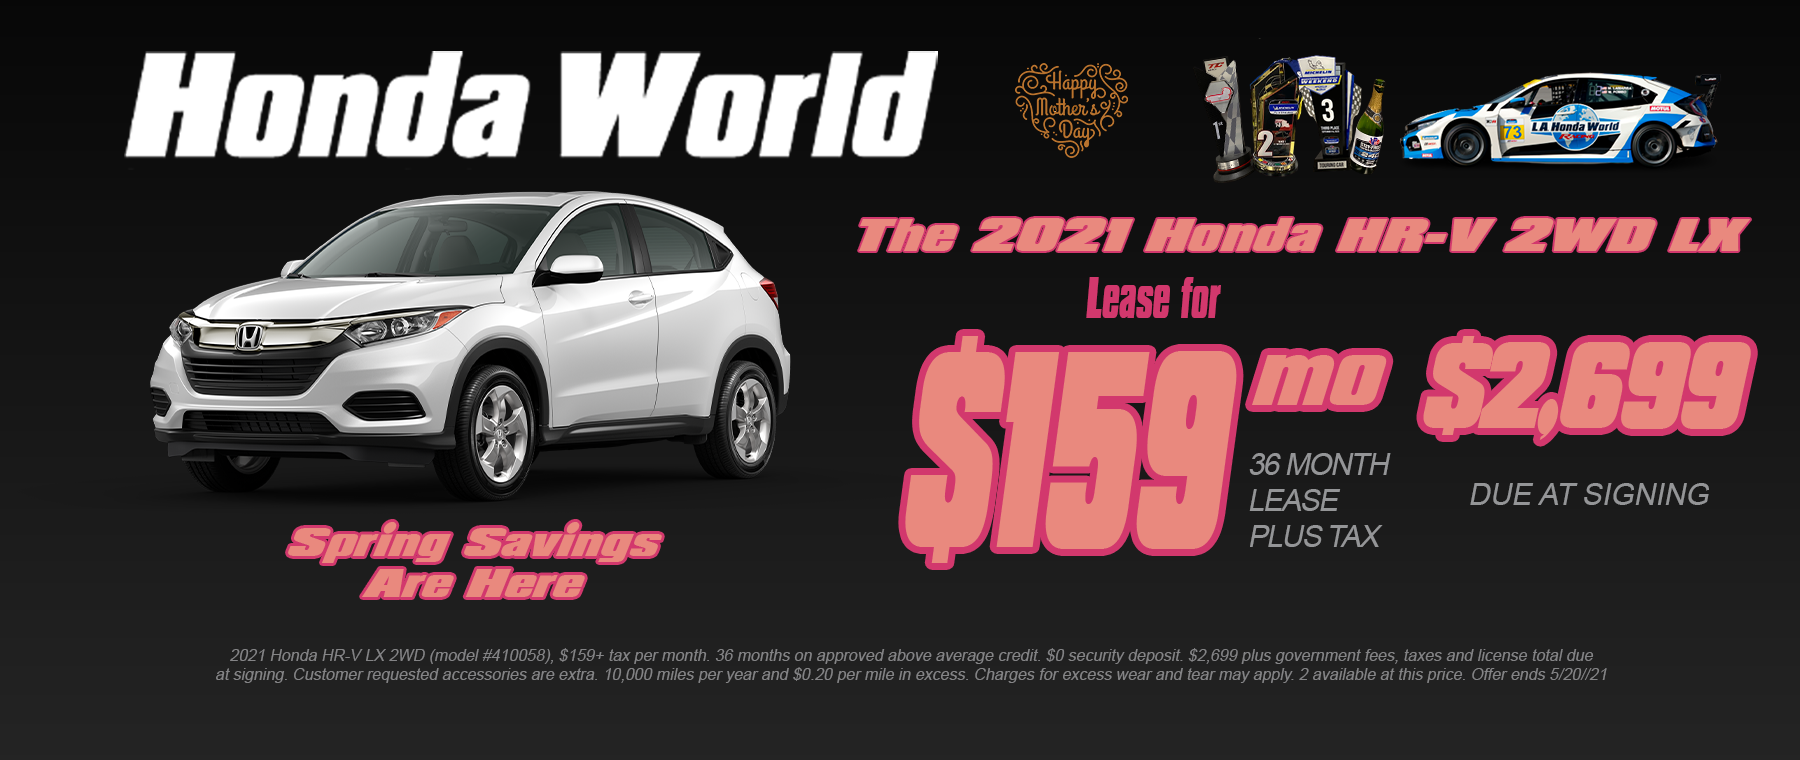 Honda HR-V Lease Special Los Angeles